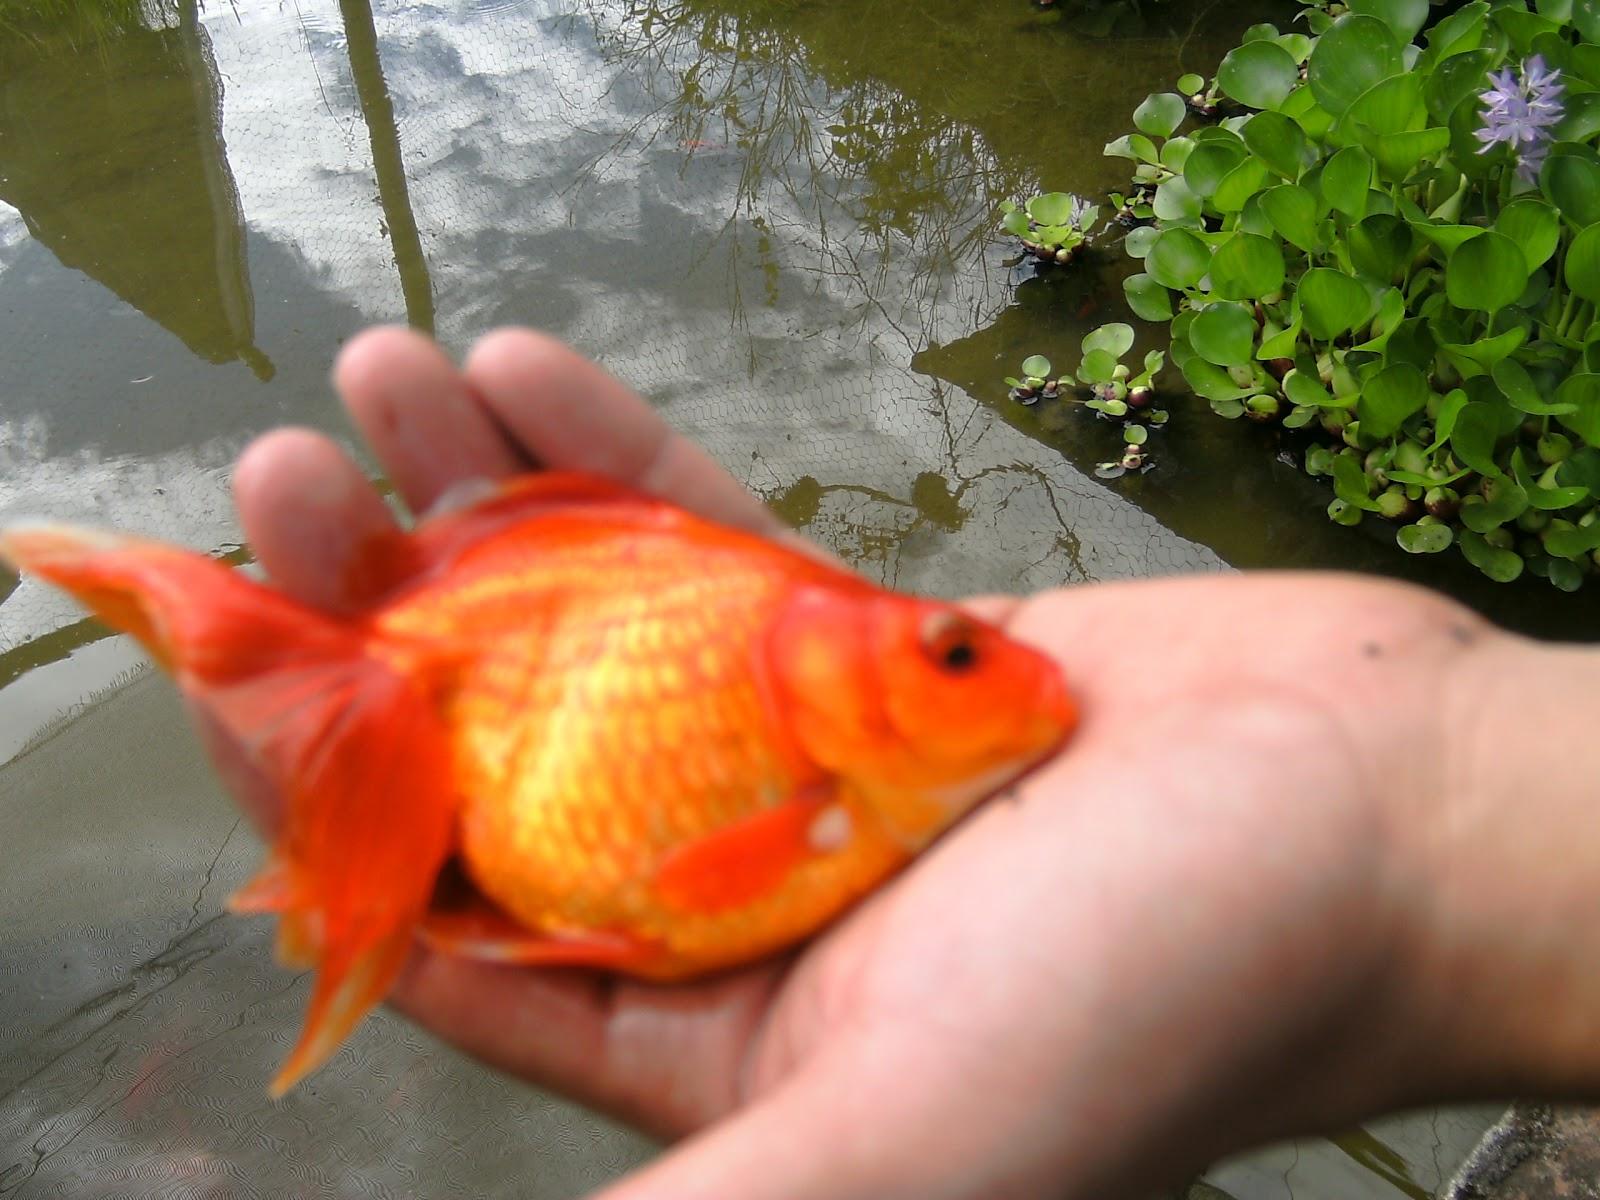 Peces arcoiris for Criadero de peces ornamentales